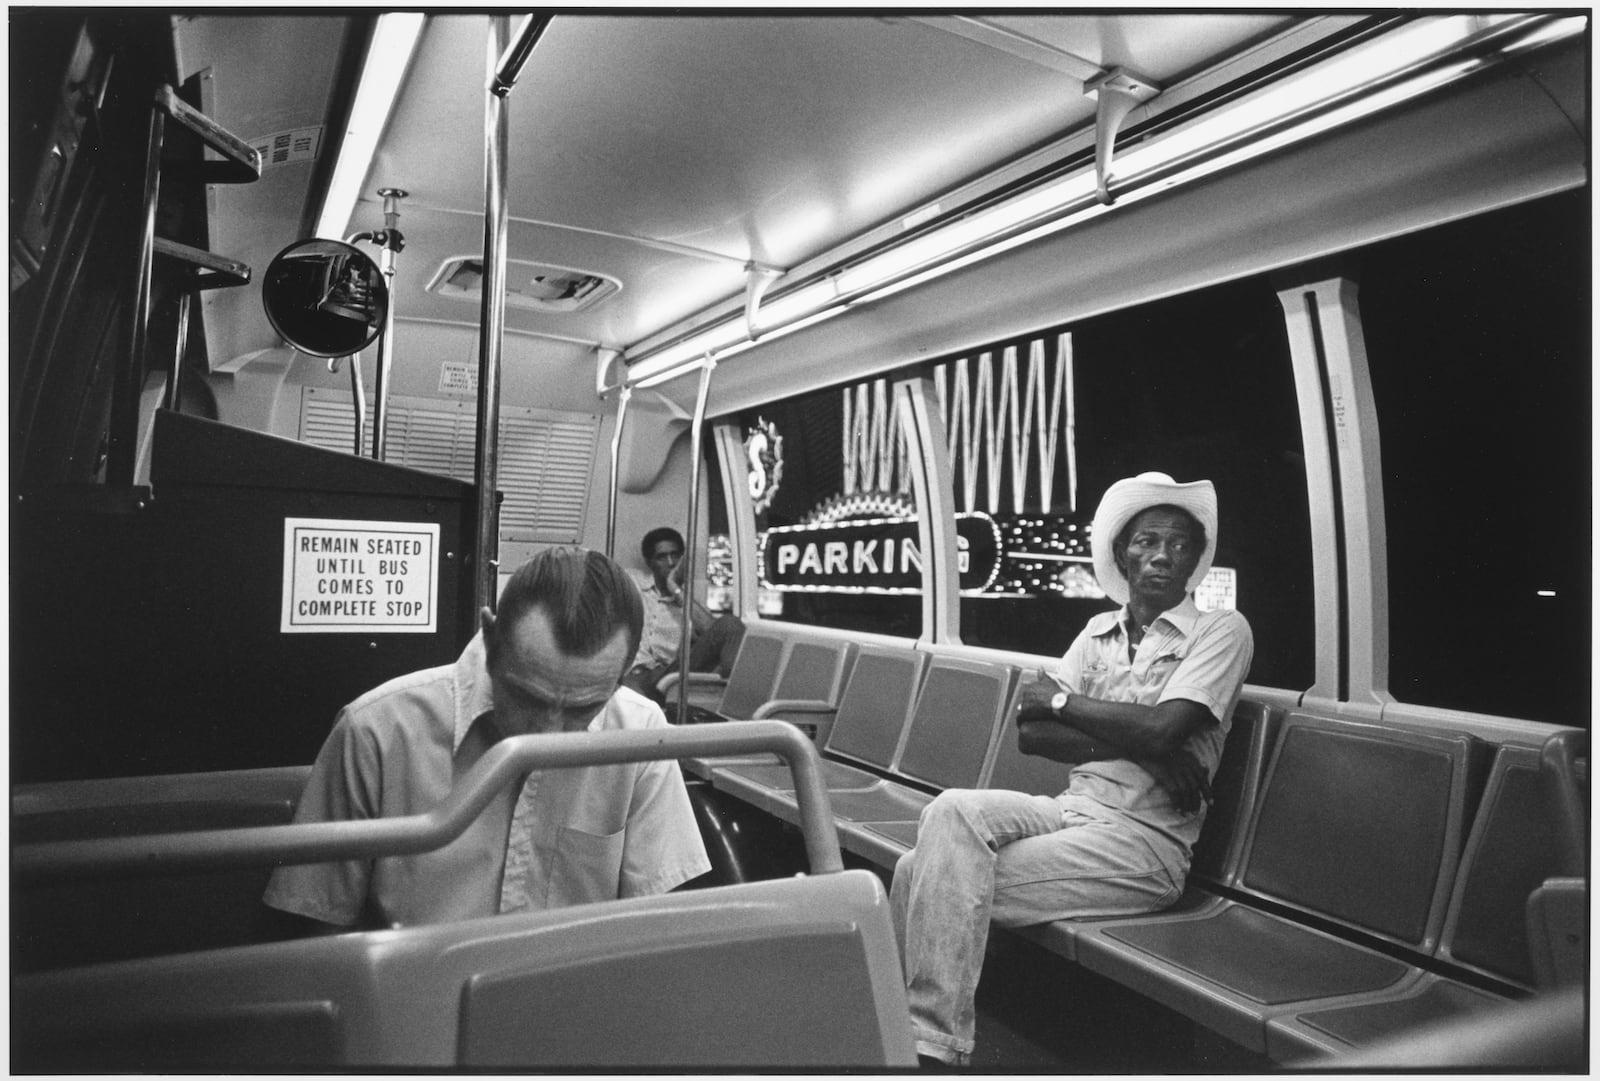 Tom Arndt, Man riding a bus, Las Vegas, 1981